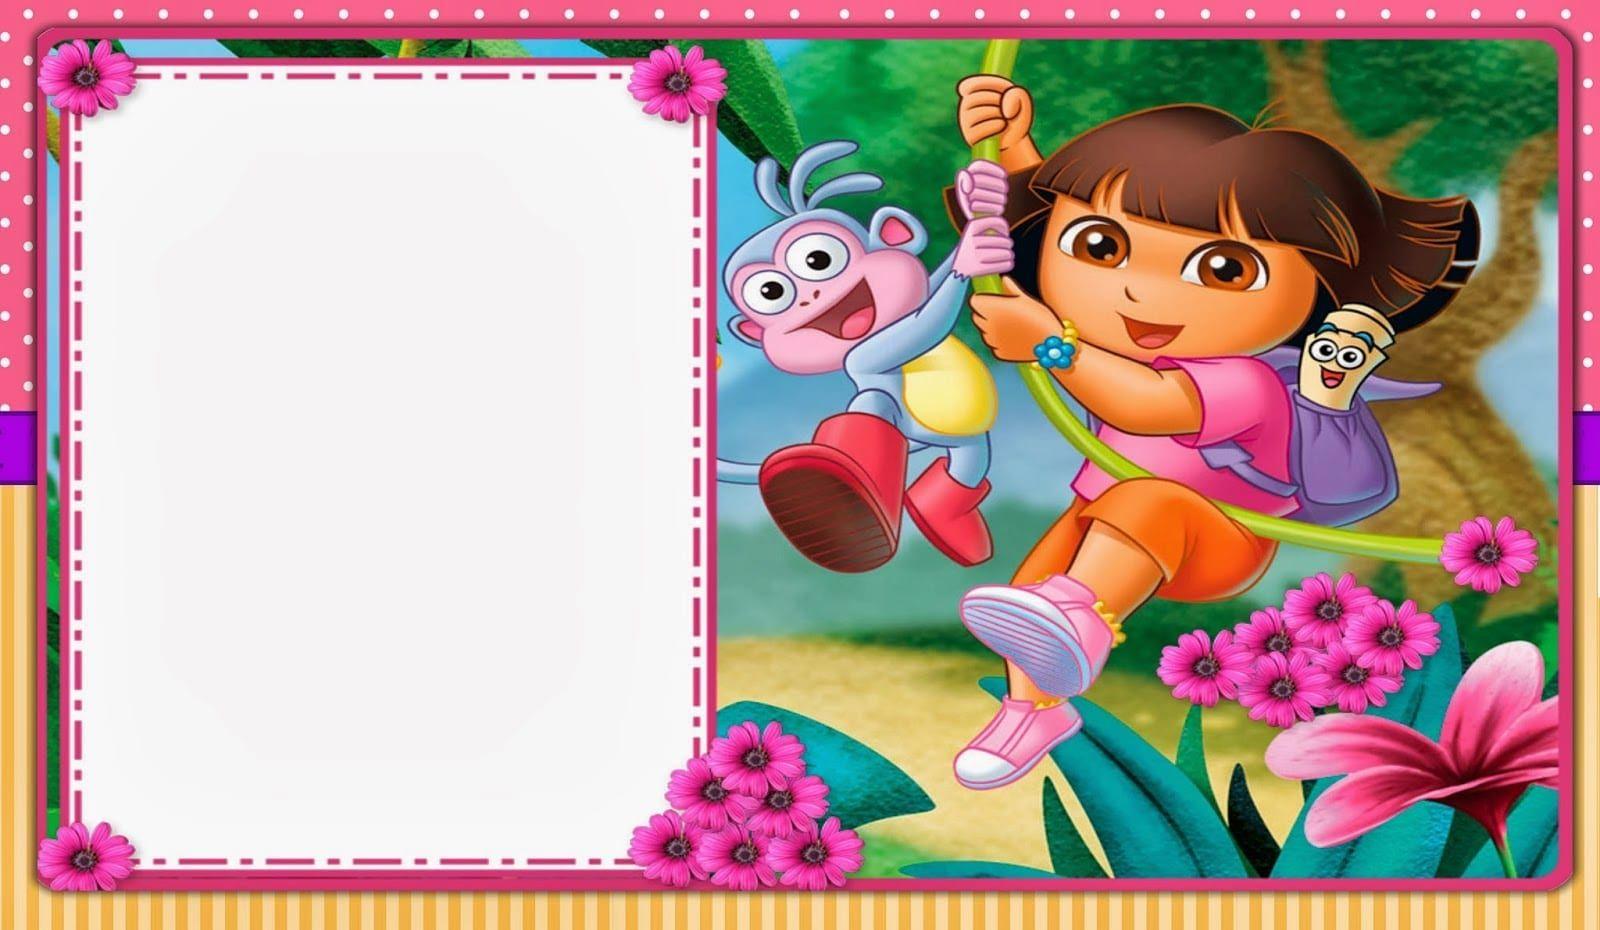 Dora The Explorer Party Invitations Free Printable Birthday Party Invitations Free Kids Birthday Invitations Printable Explorer Birthday Party